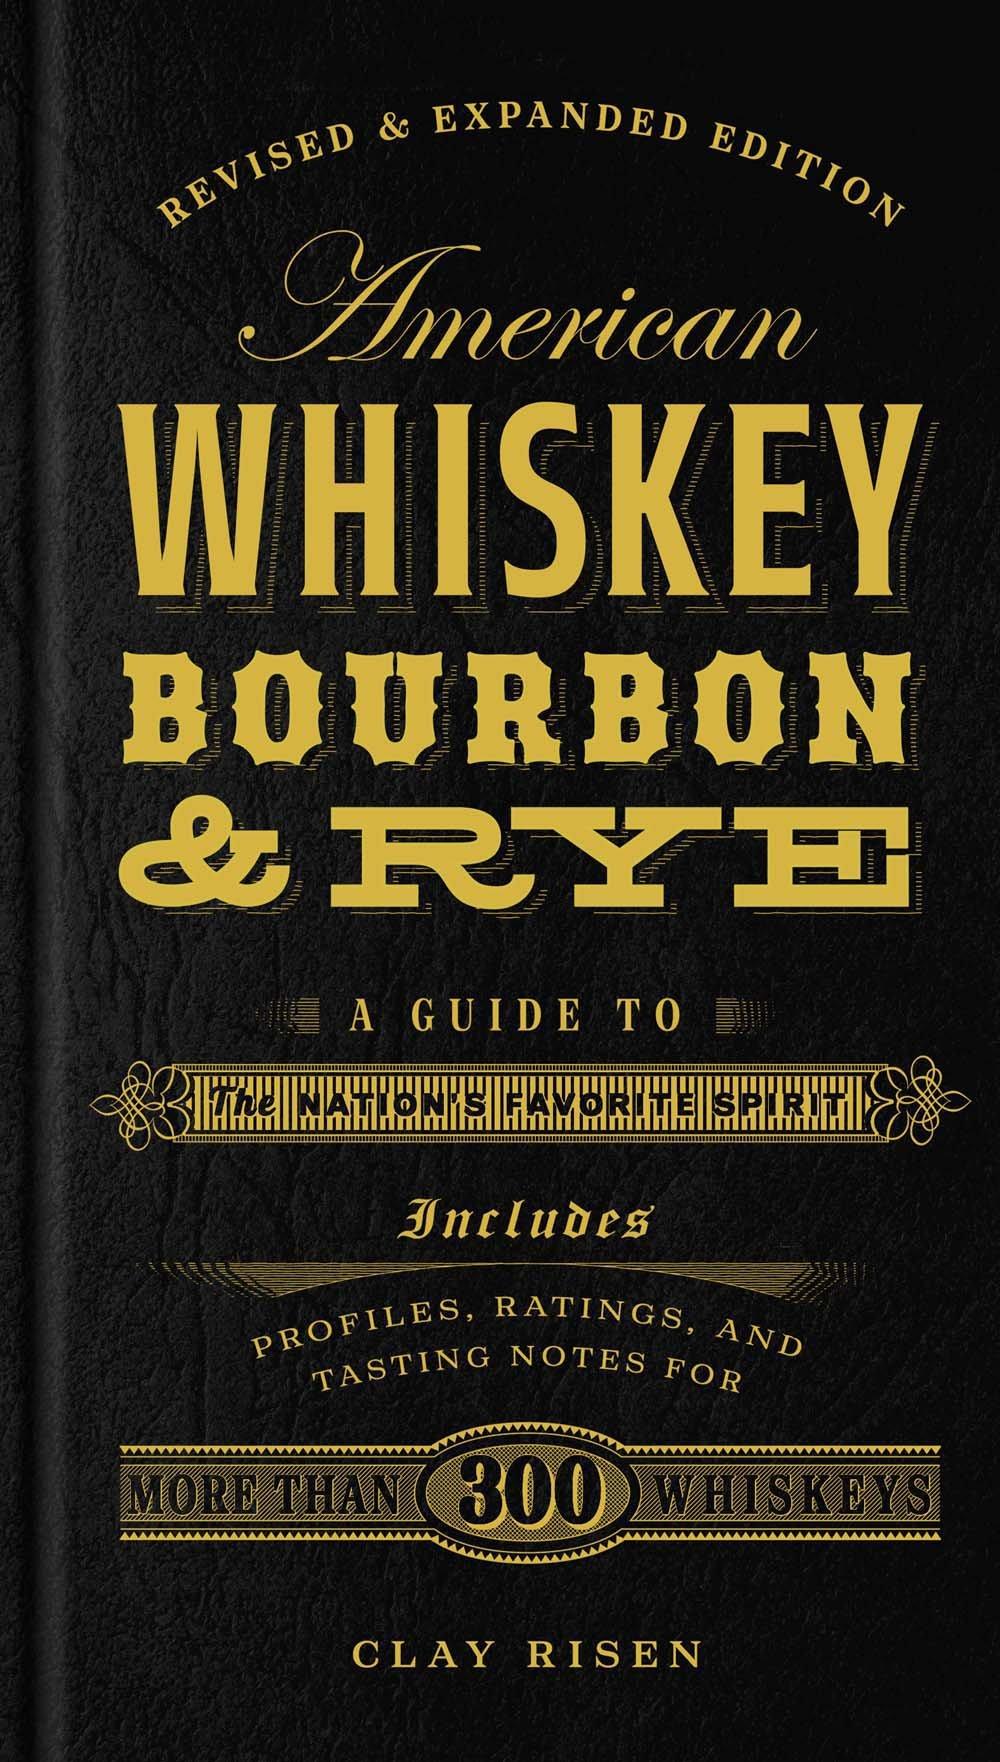 American Whiskey Bourbon & Rye.jpg